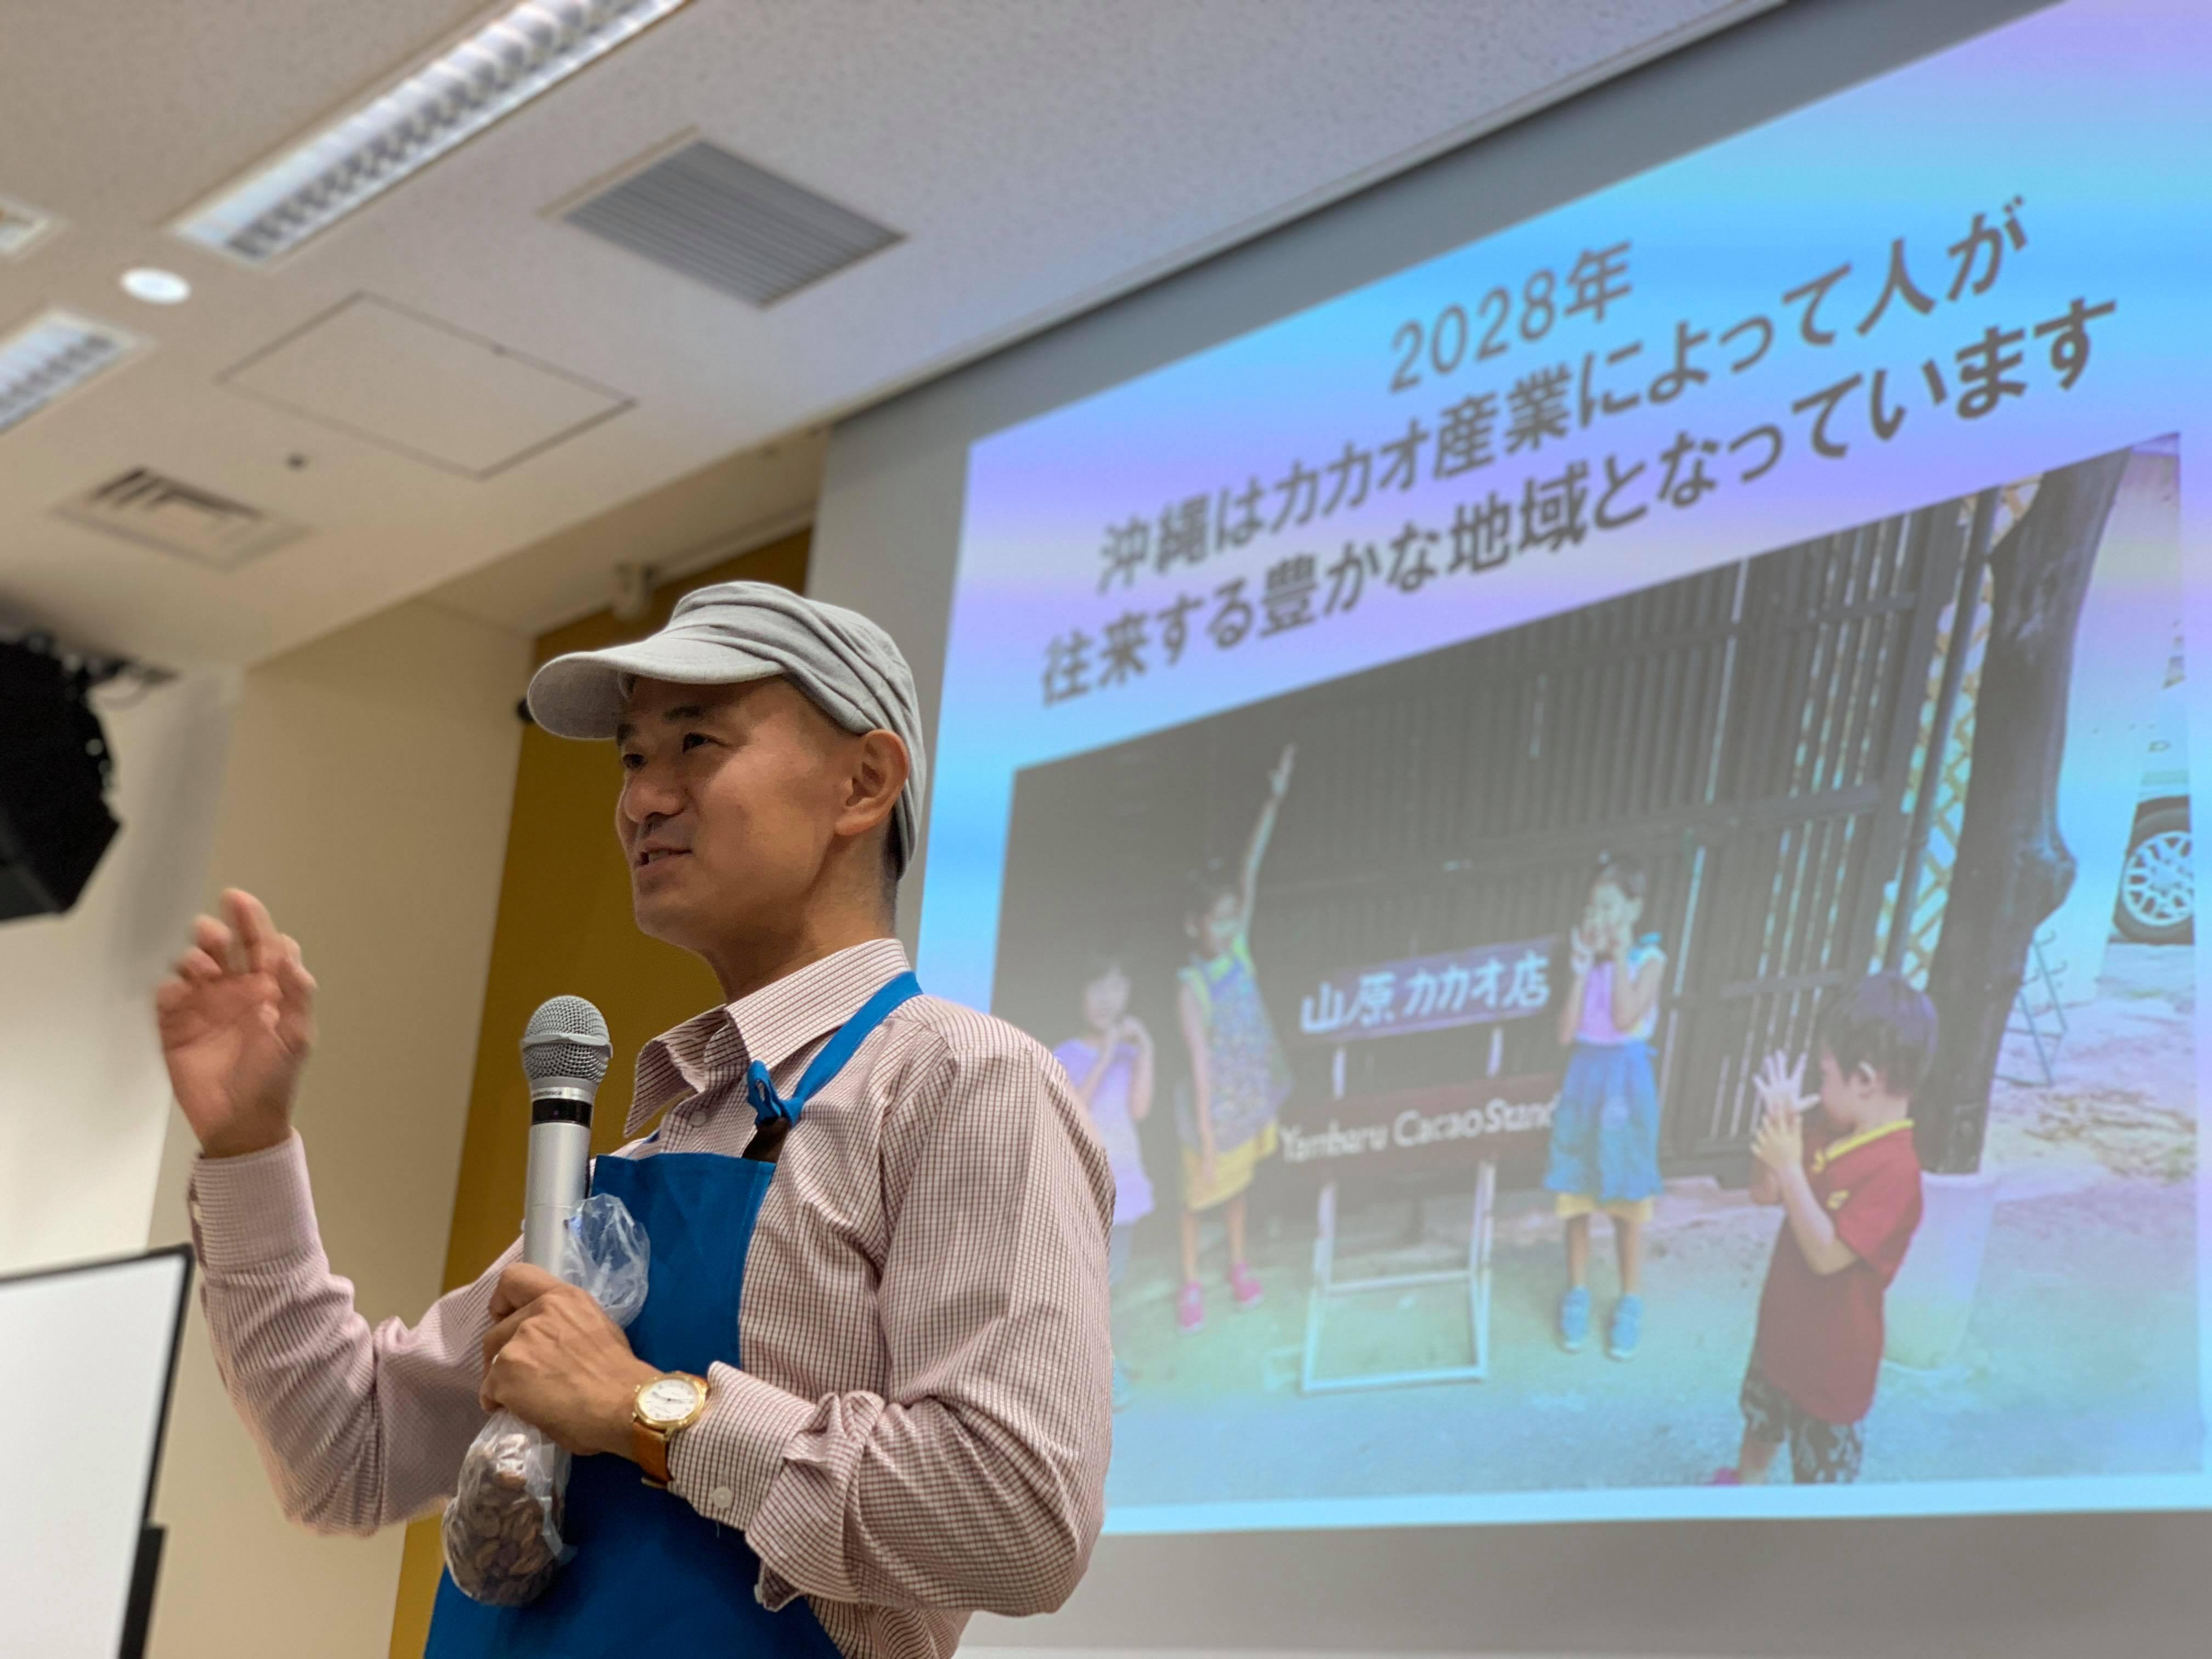 45567747 2164068630587335 848545663489671168 n - 2018年11月7日青森県東北中学校AFS(AOsukiフューチャーズゼミ)開催しました。